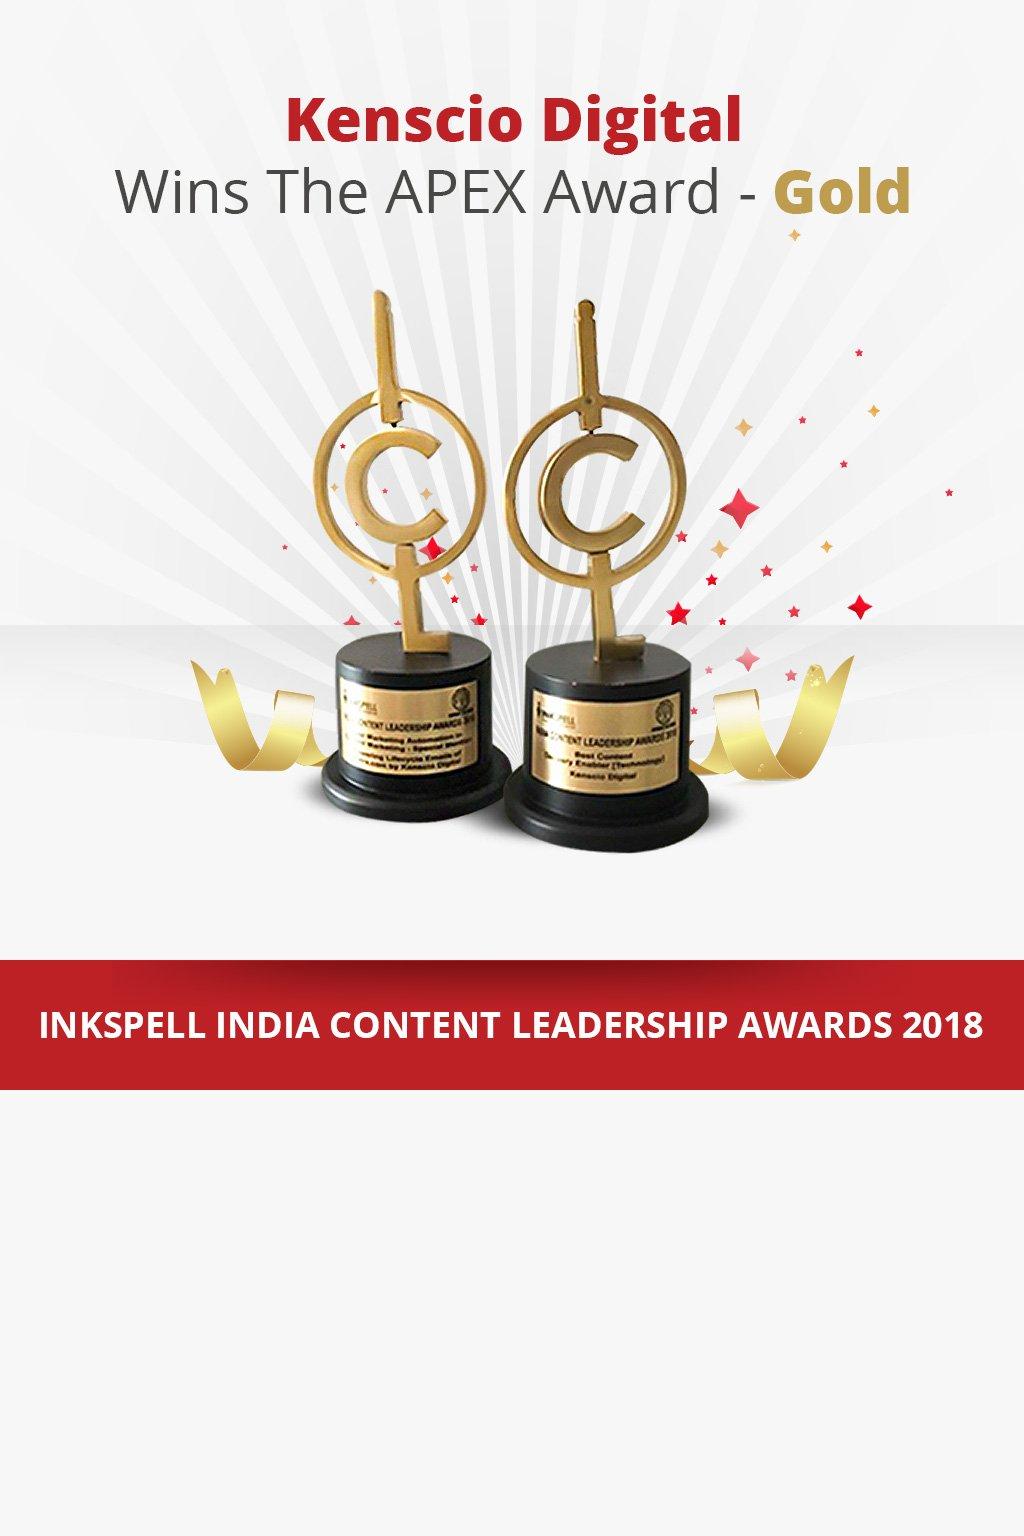 Kenscio Digital Wins The APEX Award - Gold